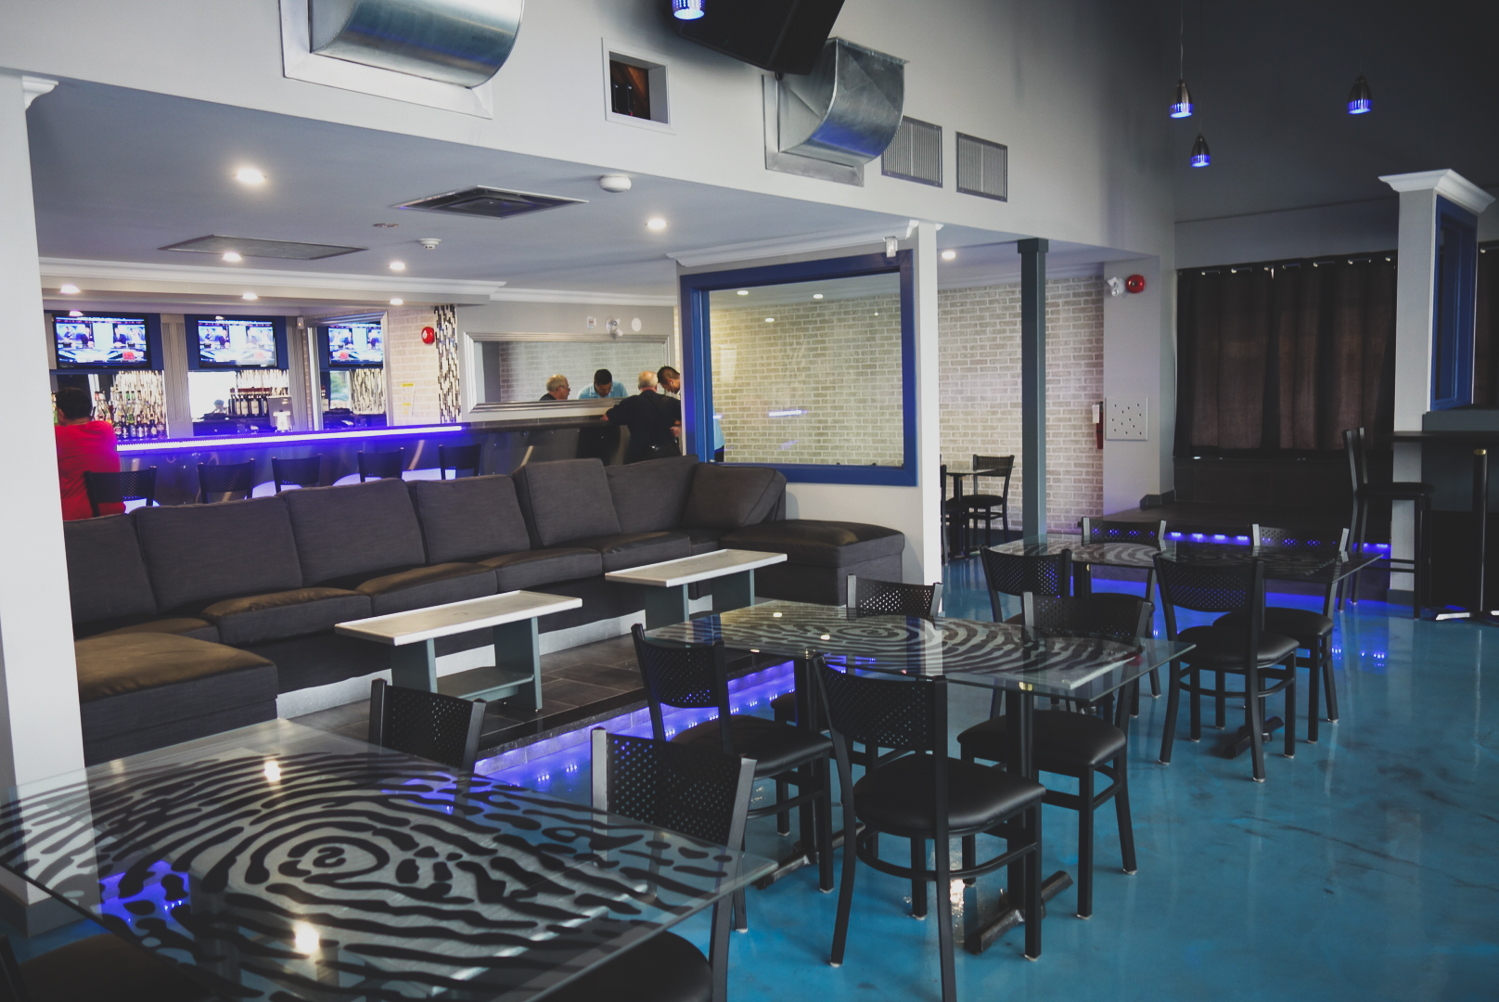 New Nightlife Spot Now Open In Brampton Bramptonist